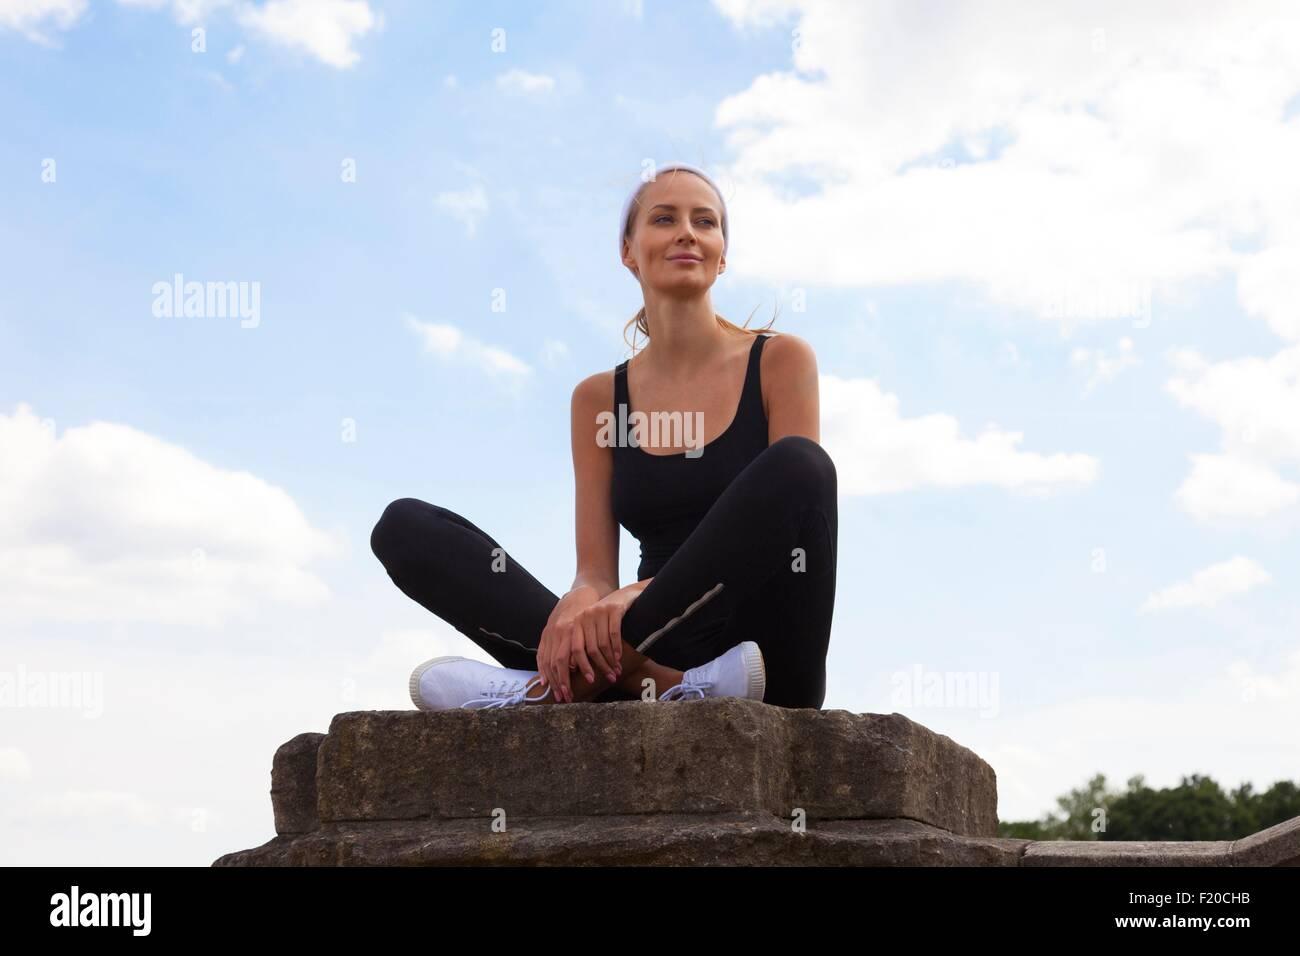 Portrait of woman sitting on pedestal - Stock Image